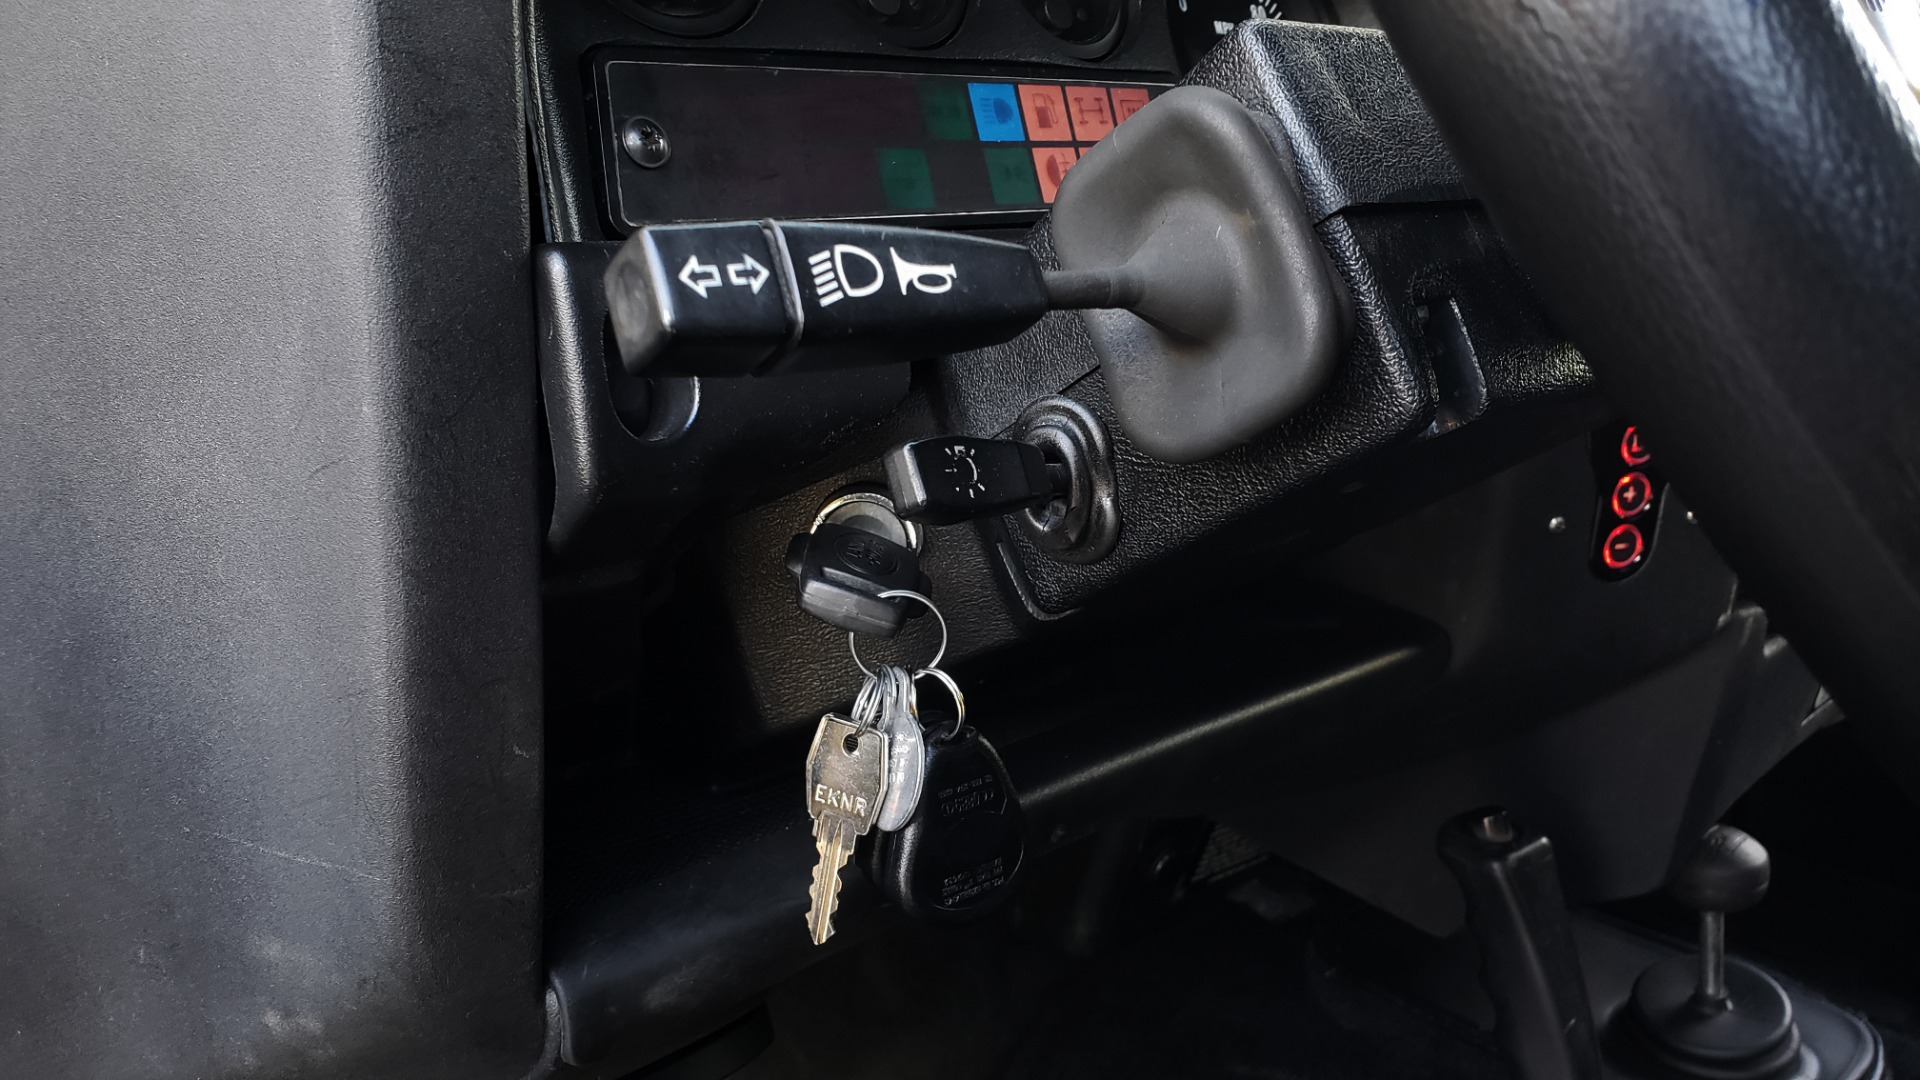 Used 1985 Land Rover DEFENDER 90 4X4 CUSTOM RESTORED 5.3L LS V8 for sale Sold at Formula Imports in Charlotte NC 28227 29